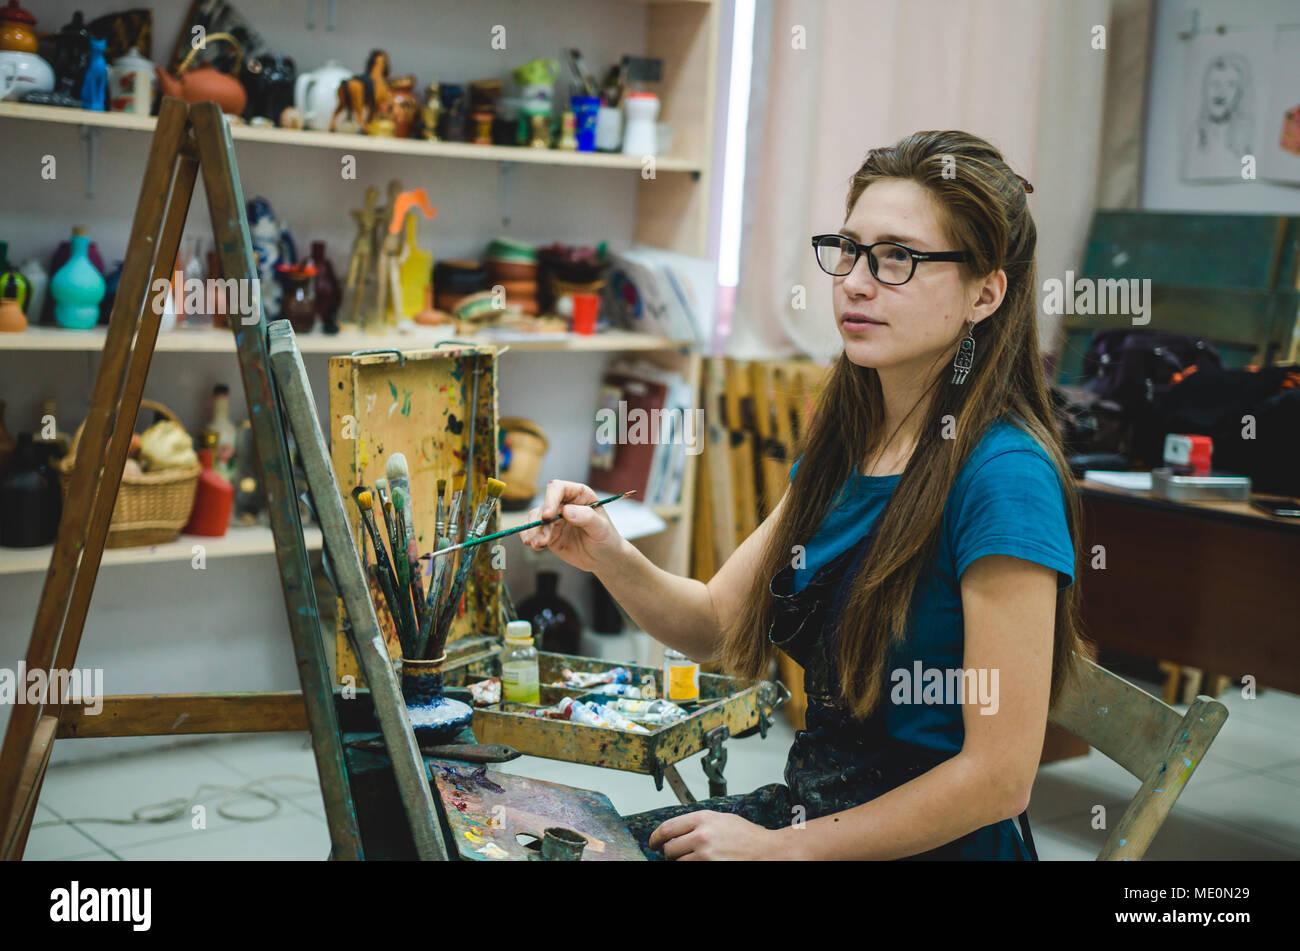 Pretty girl artista pinturas sobre lienzo en art studio Imagen De Stock